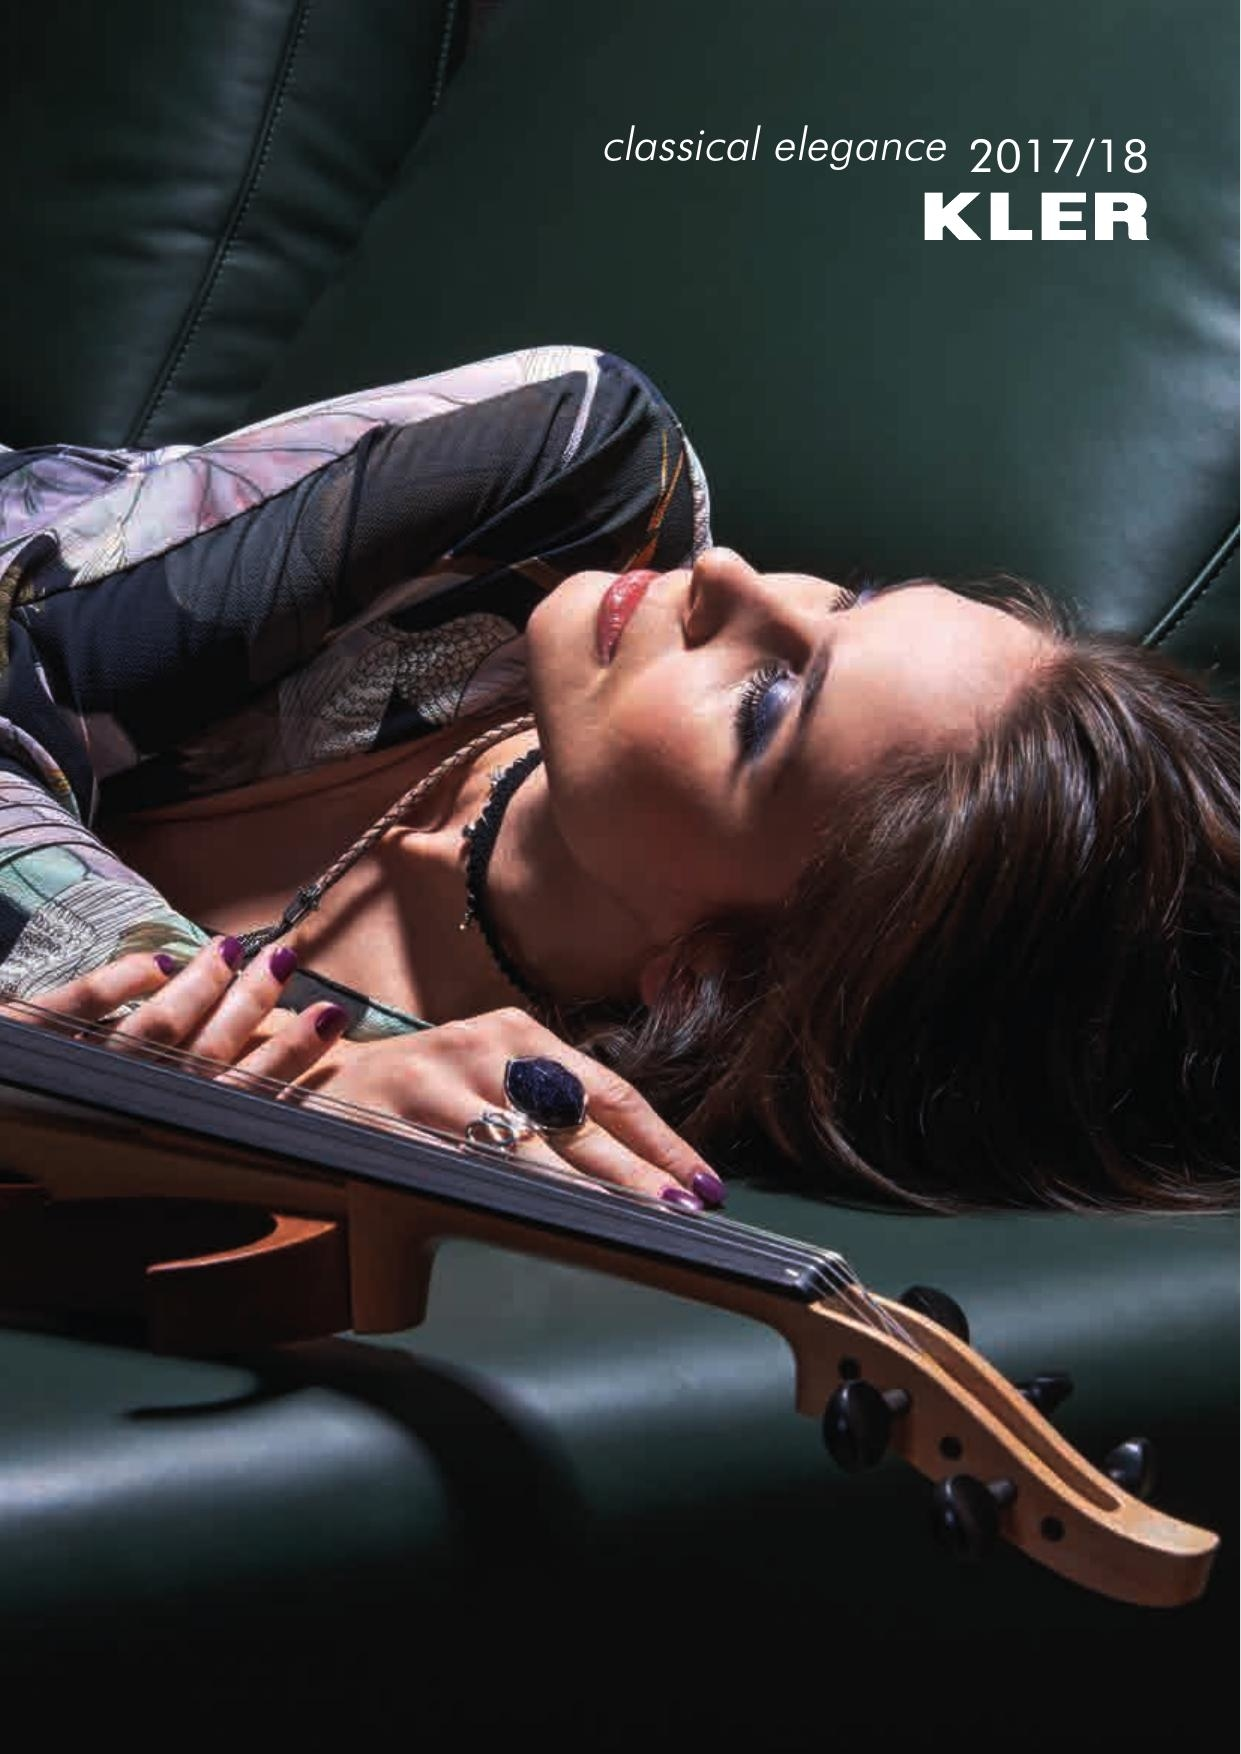 Gazetka: classical elegance 2017/2018 - strona 1